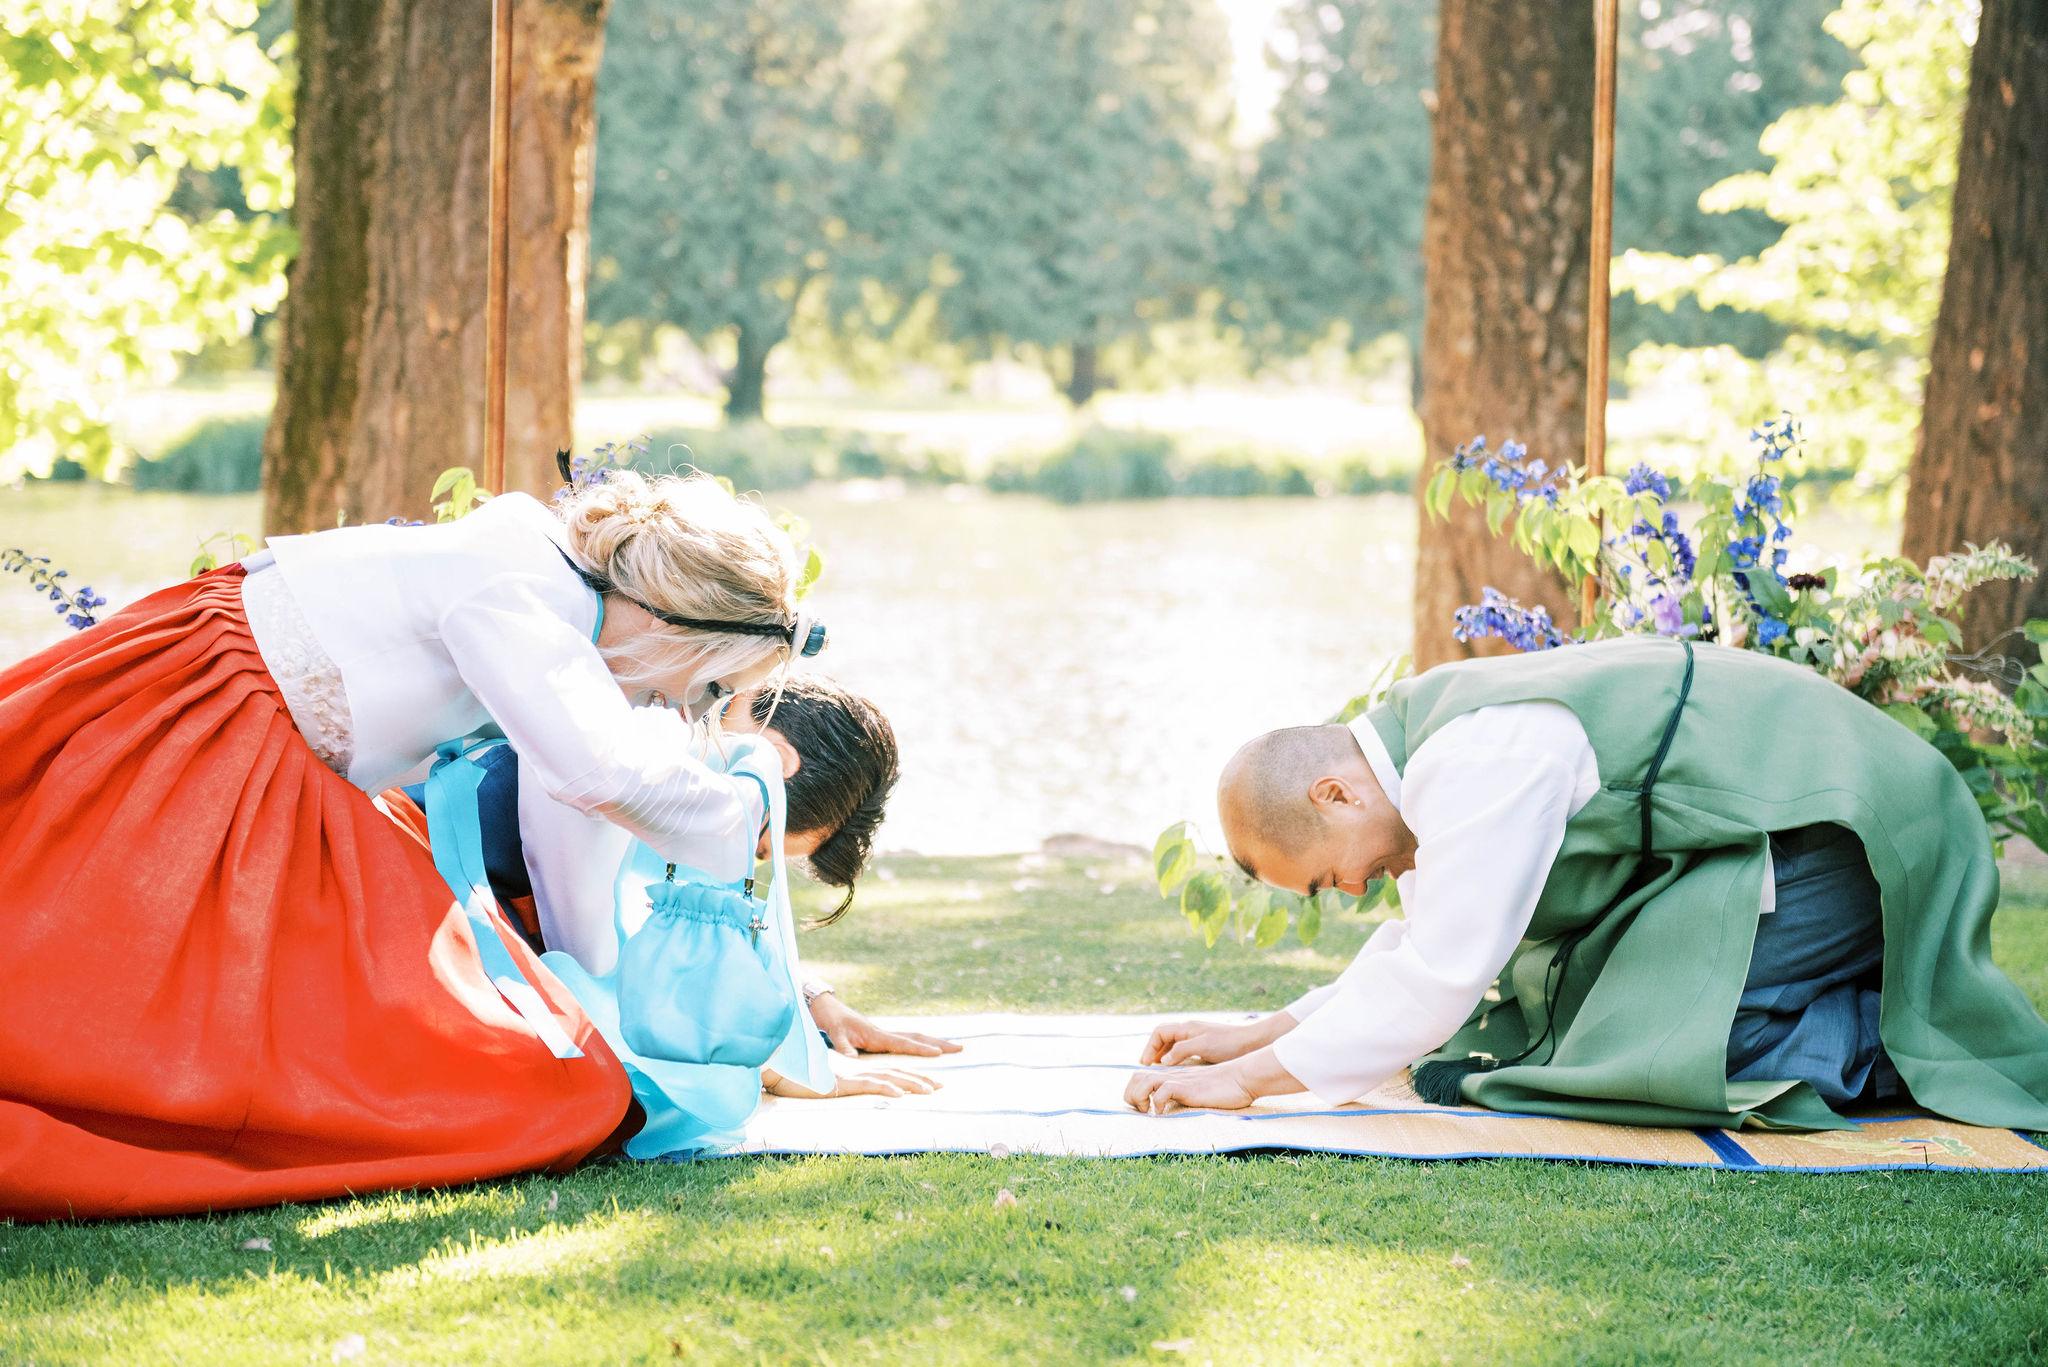 Crystal_Springs_Garden_Wedding(11of18)